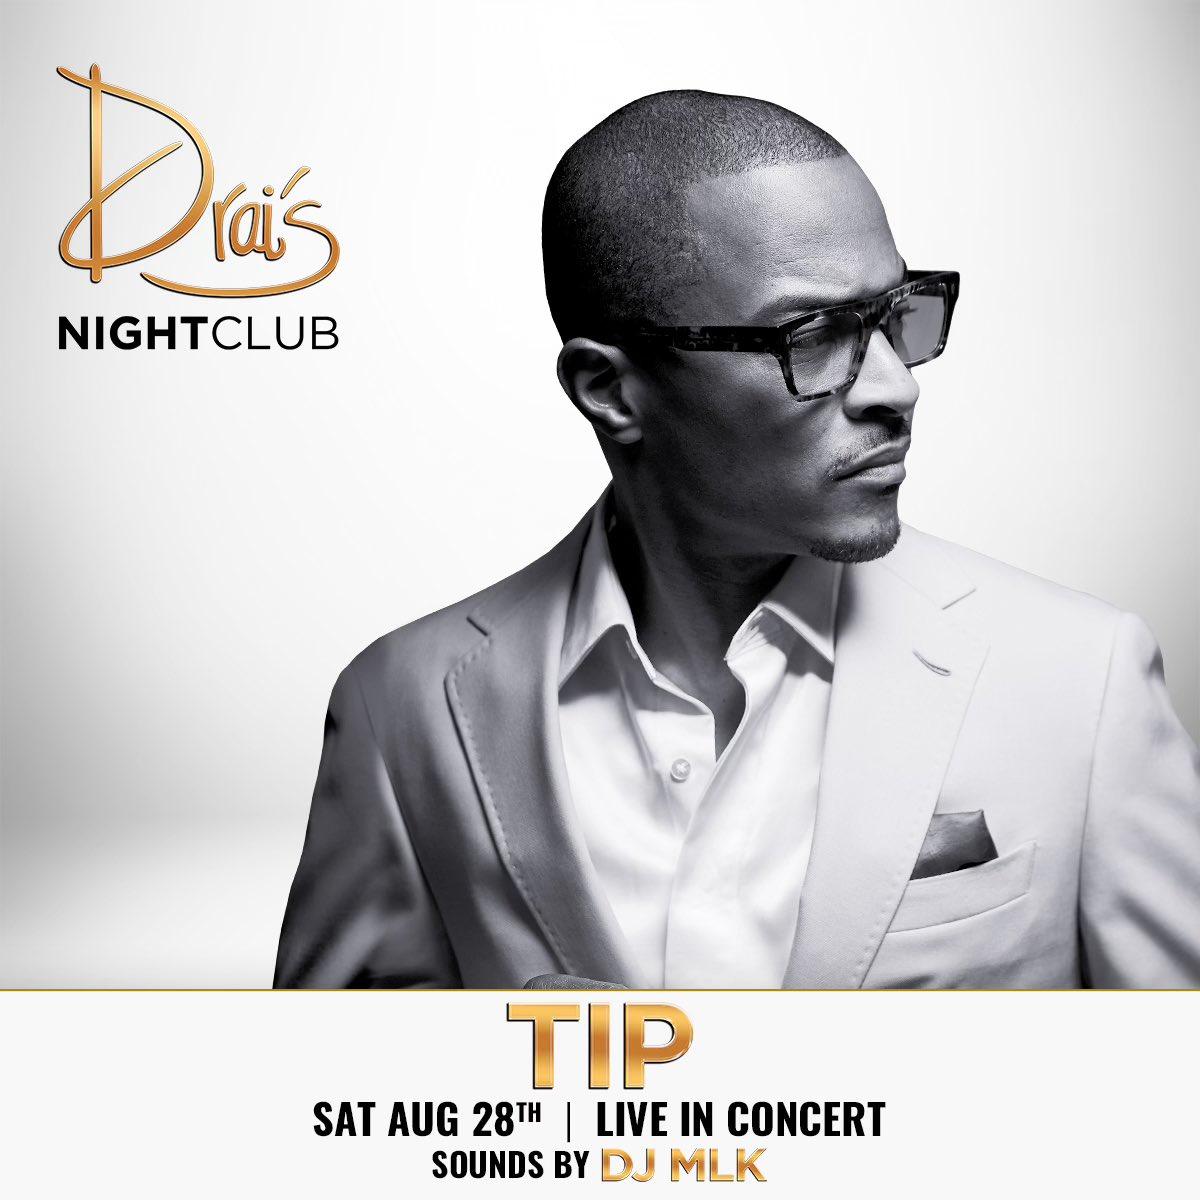 #LasVegas we going 🆙 tonight @DraisLV ::: @DJMLK TURN IT !!!